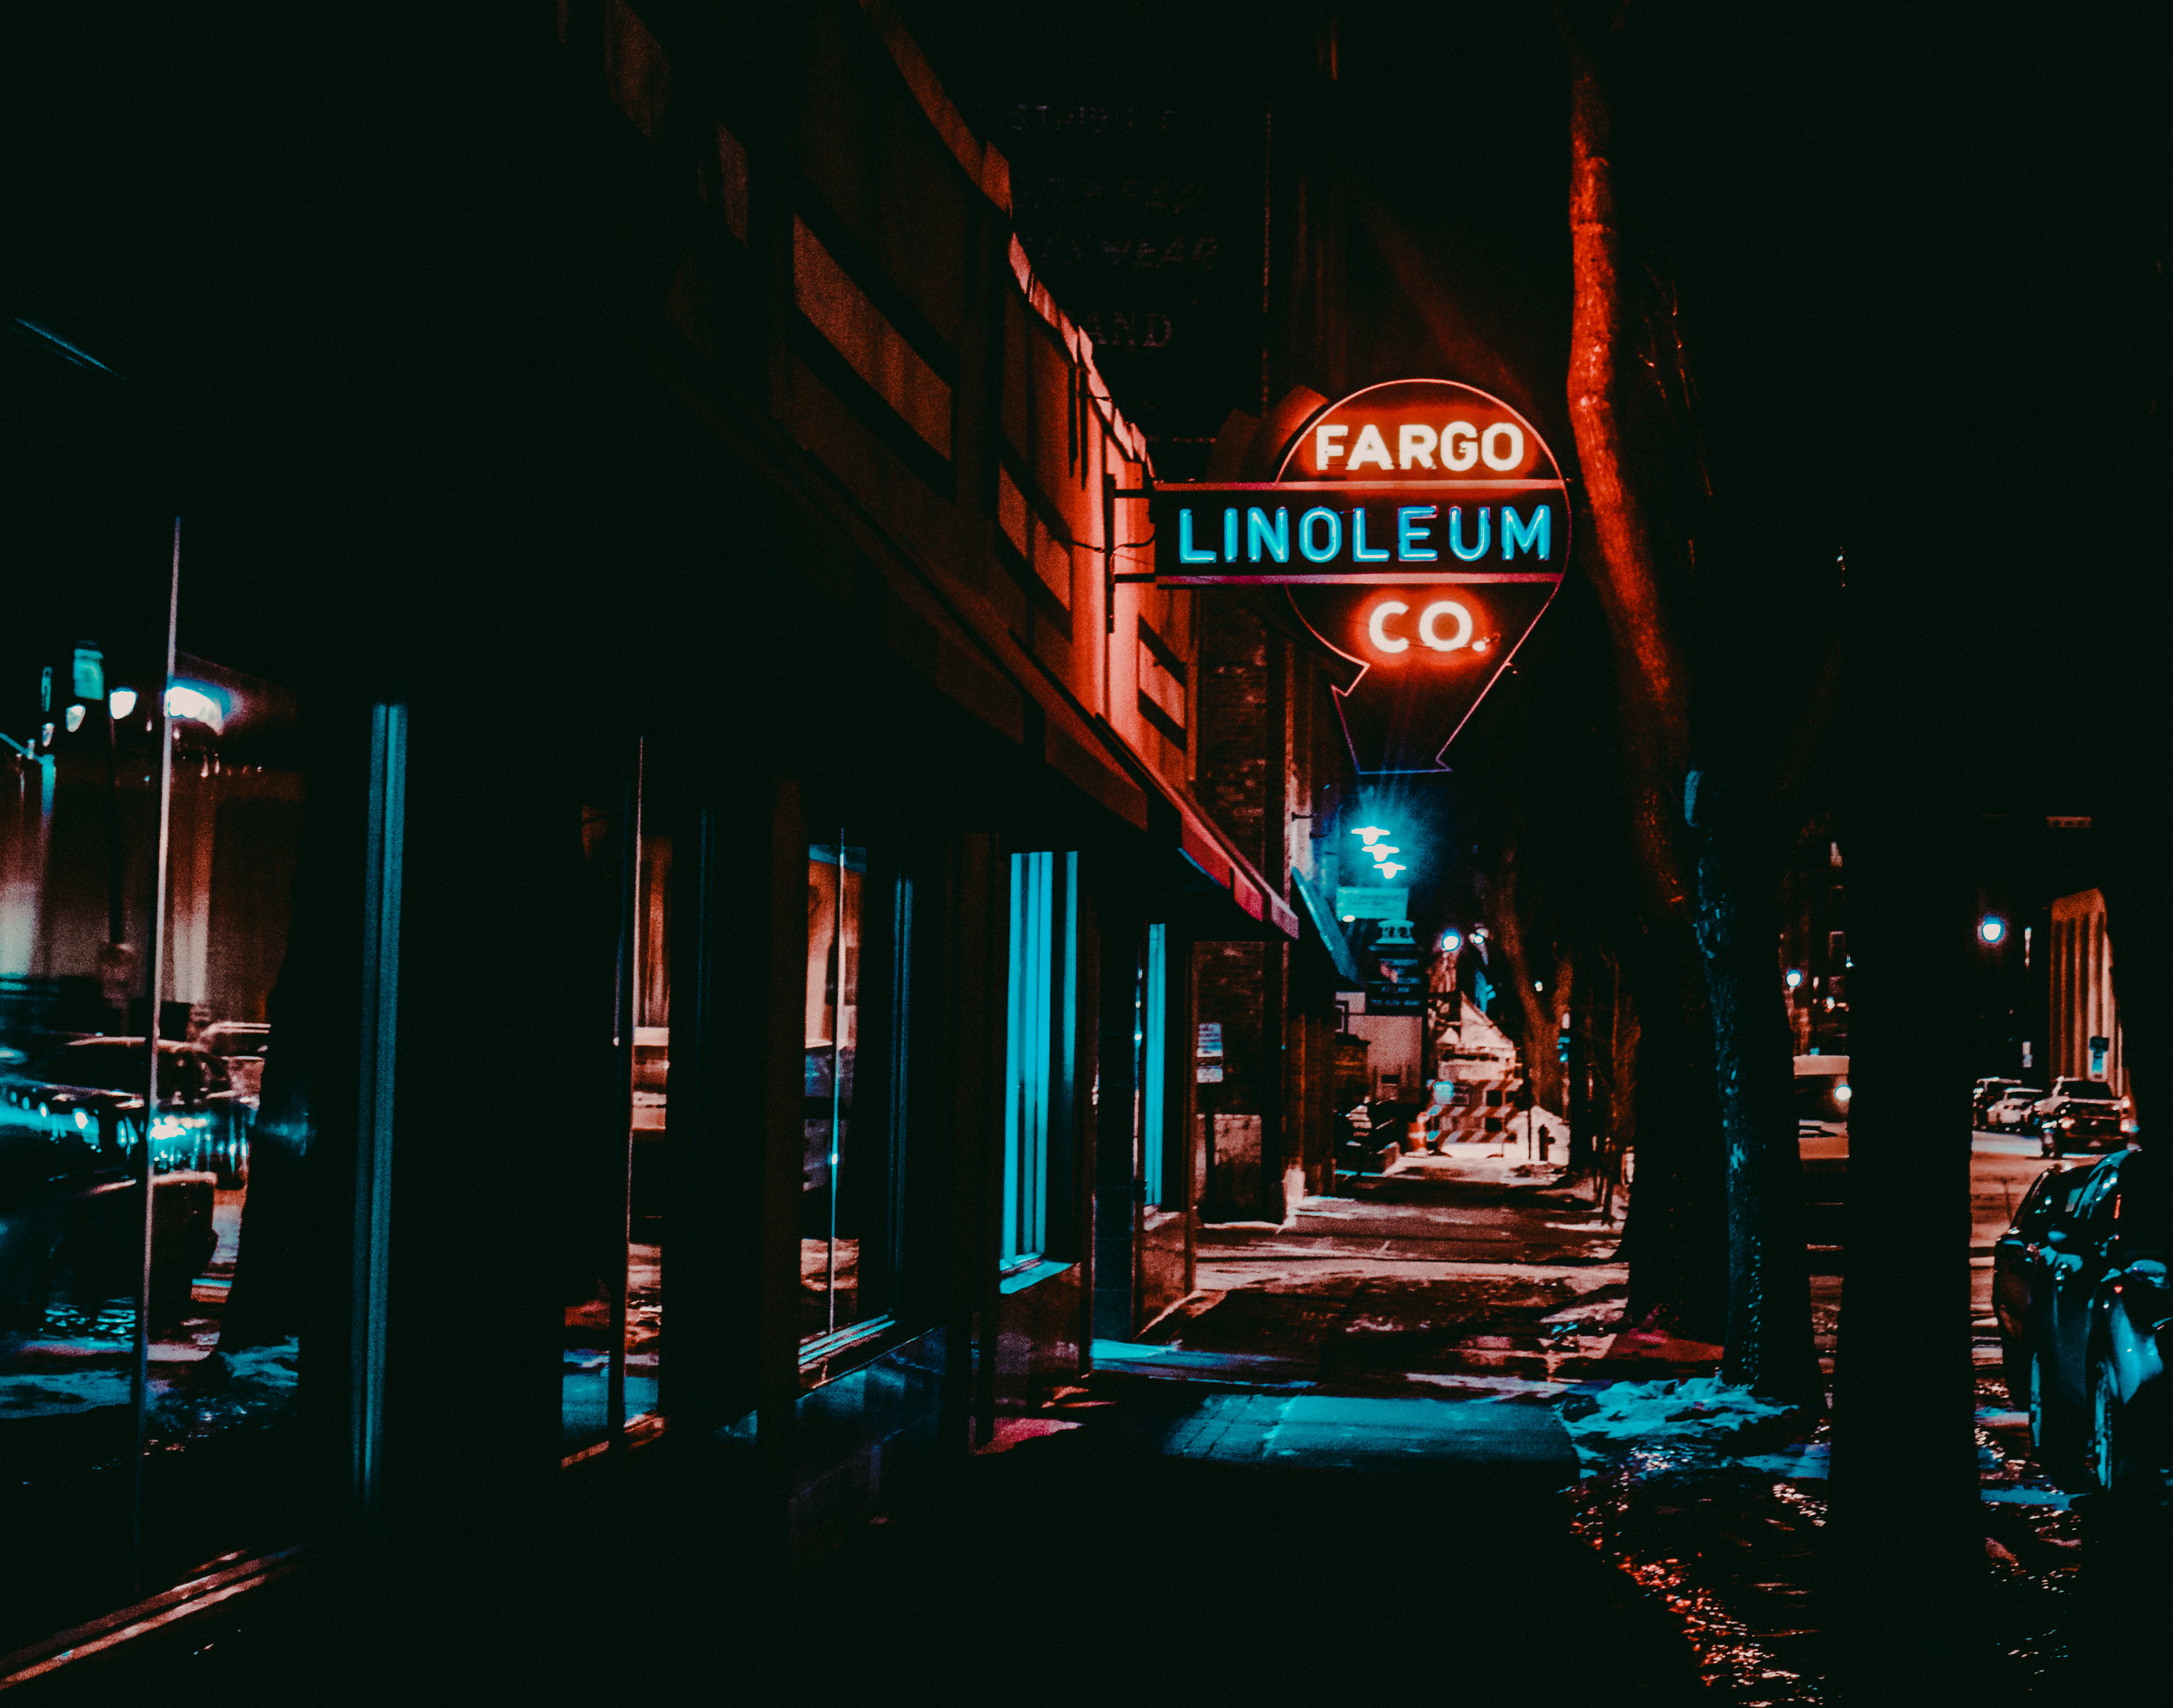 fargo-linoleum-2-2.jpg